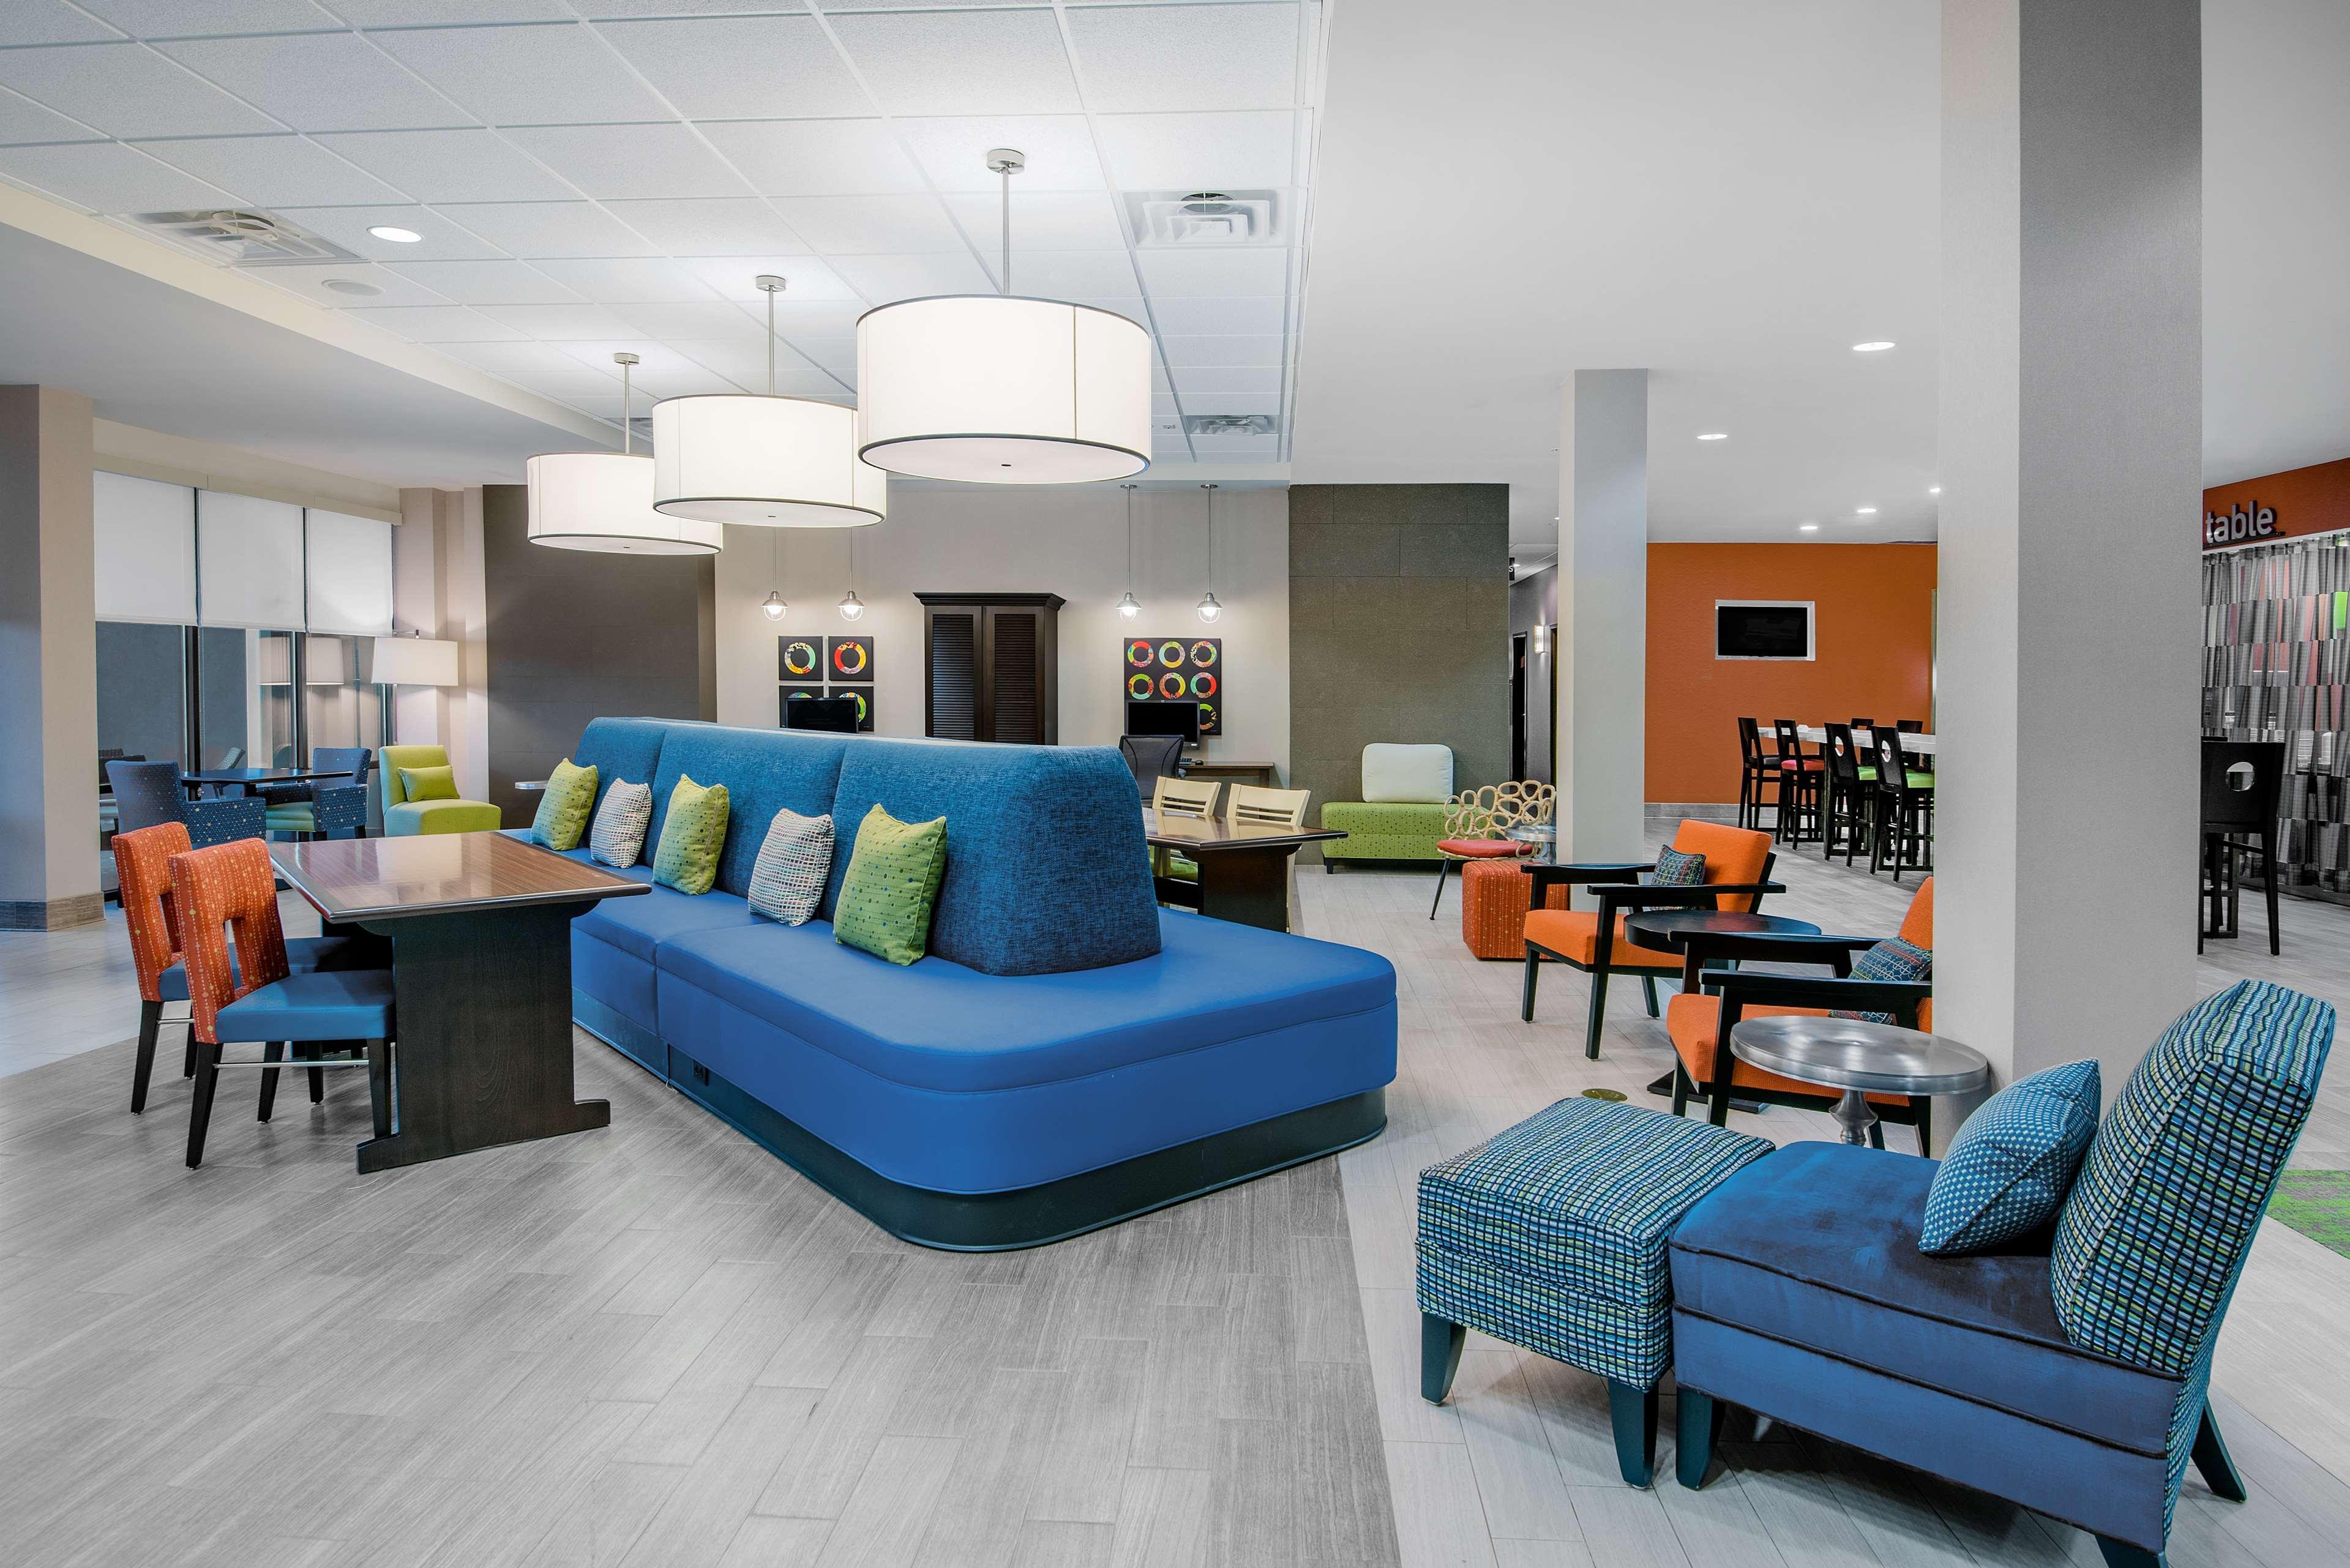 Home2 Suites by Hilton Austin Airport image 6